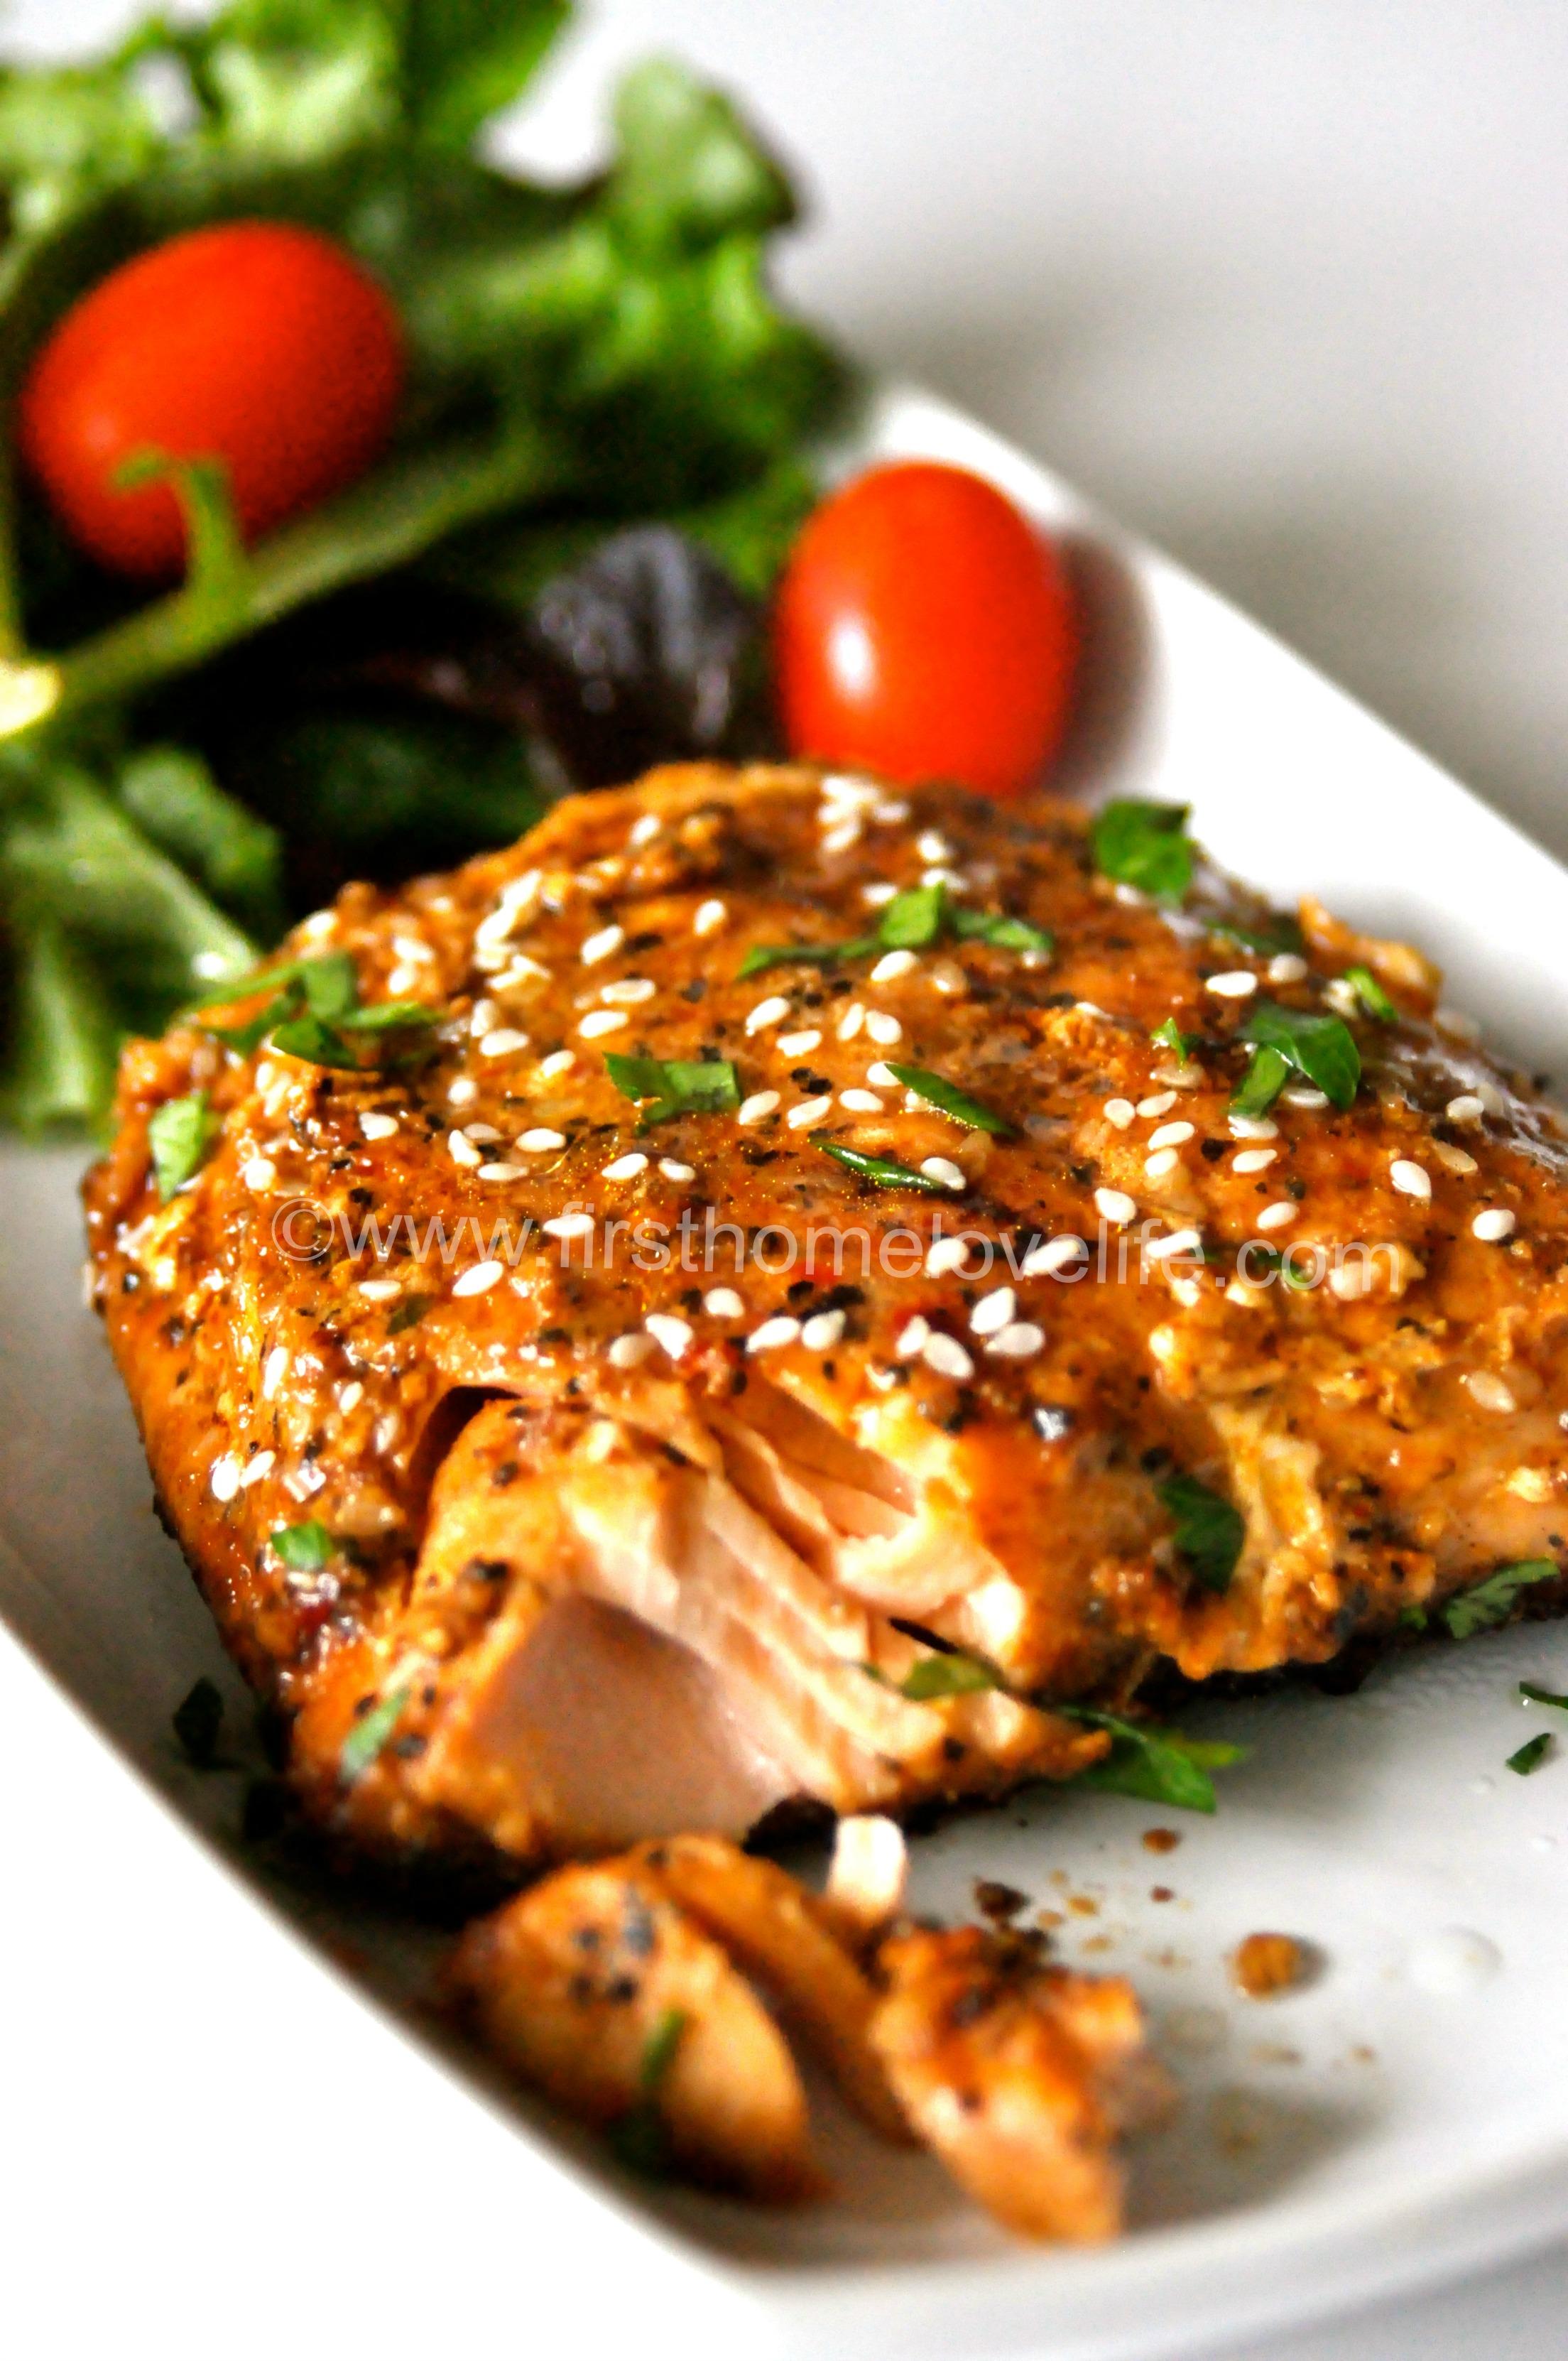 Macaroni Grill Inspired Teriyaki Salmon First Home Love Life